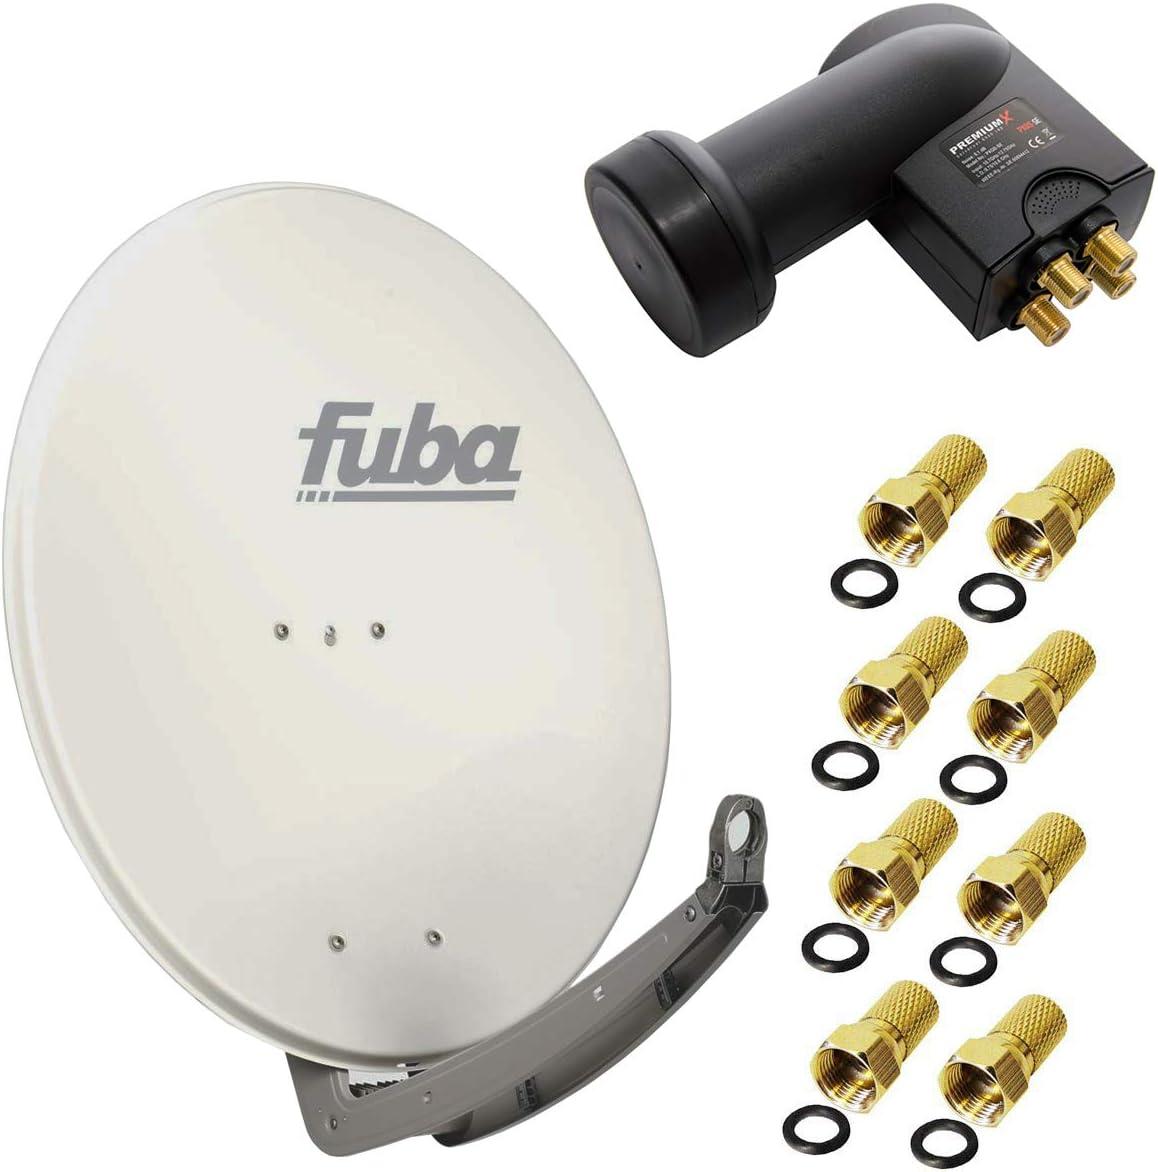 Fuba DAA 780 A 74 x 84 cm – Antena parabólica (aluminio antratzit + LNB Quad de 0,1 dB PremiumX PXQS-04 04 Quattro Switch para conexión directa de 4 ...